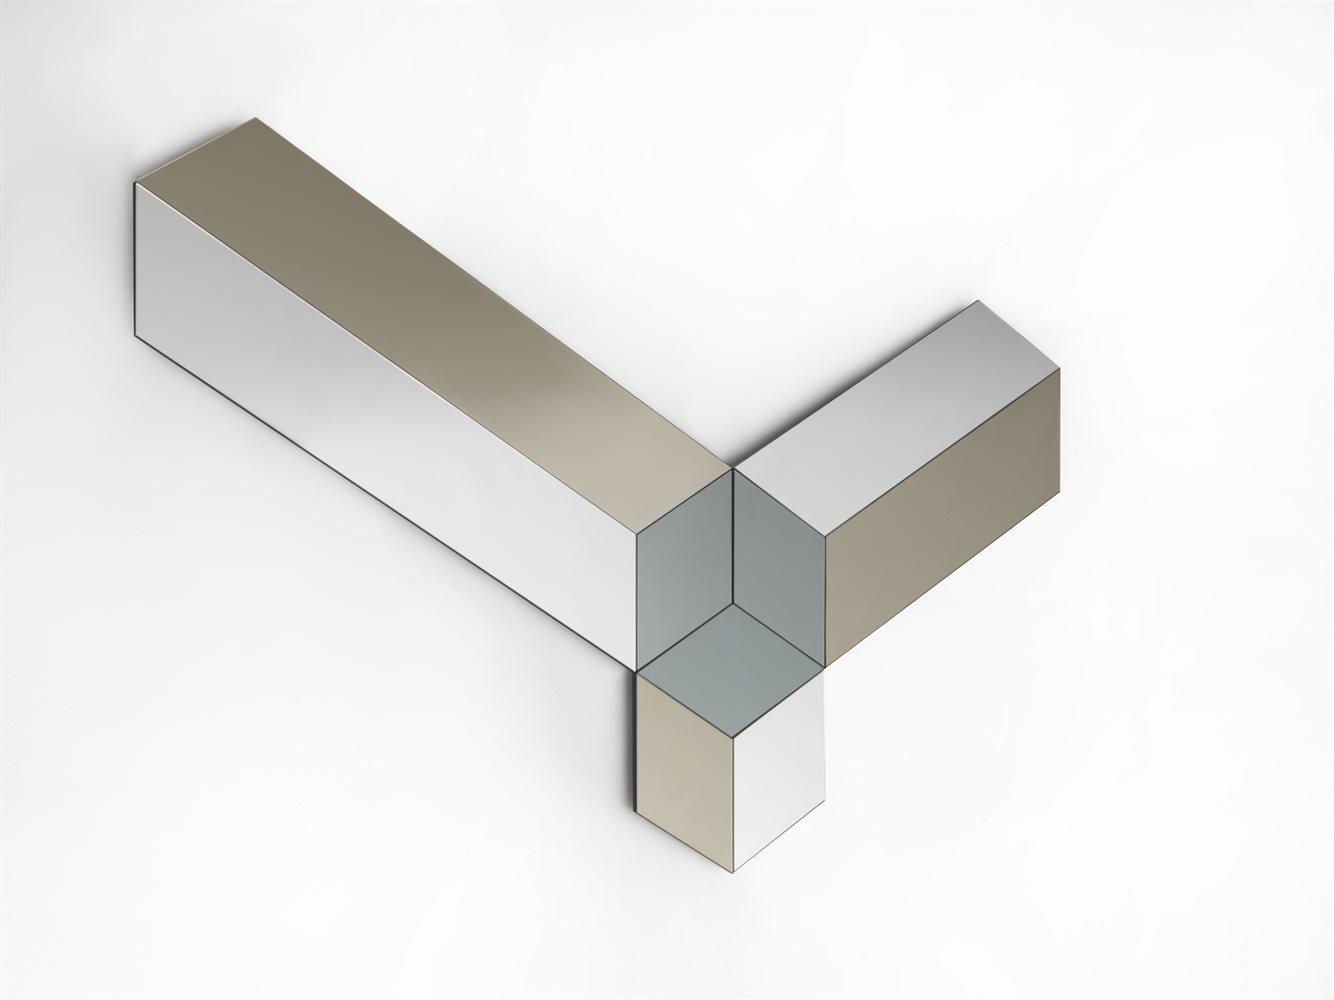 EGO Wall Mirror from Porada, designed by T. Colzani